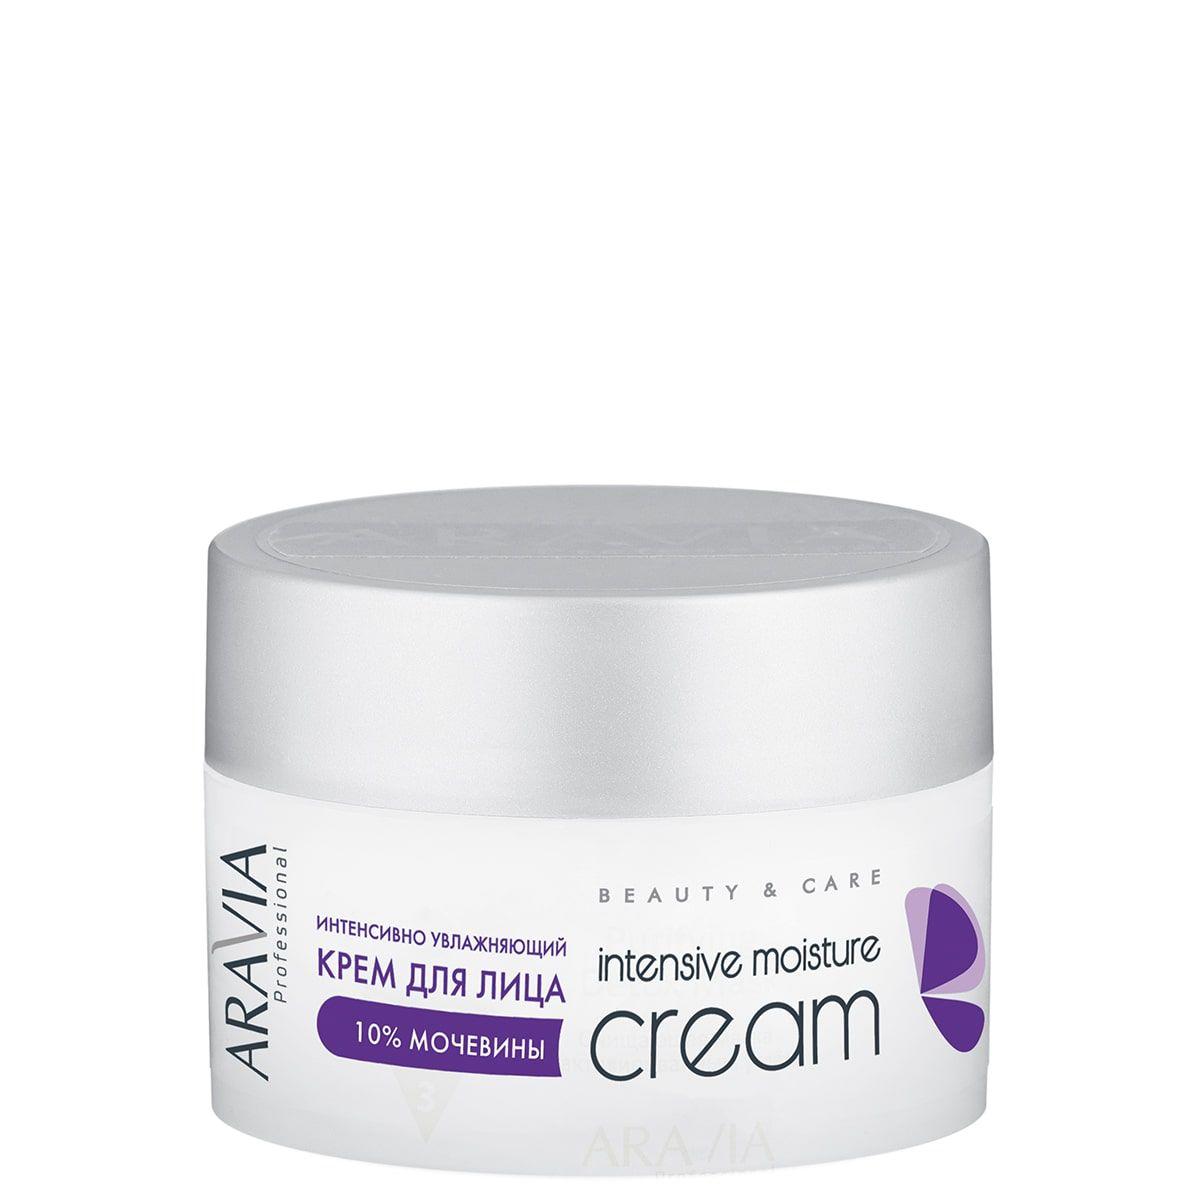 Face Cream Intensive Moisturizing Intensive Moisture With мочевиной (10%)